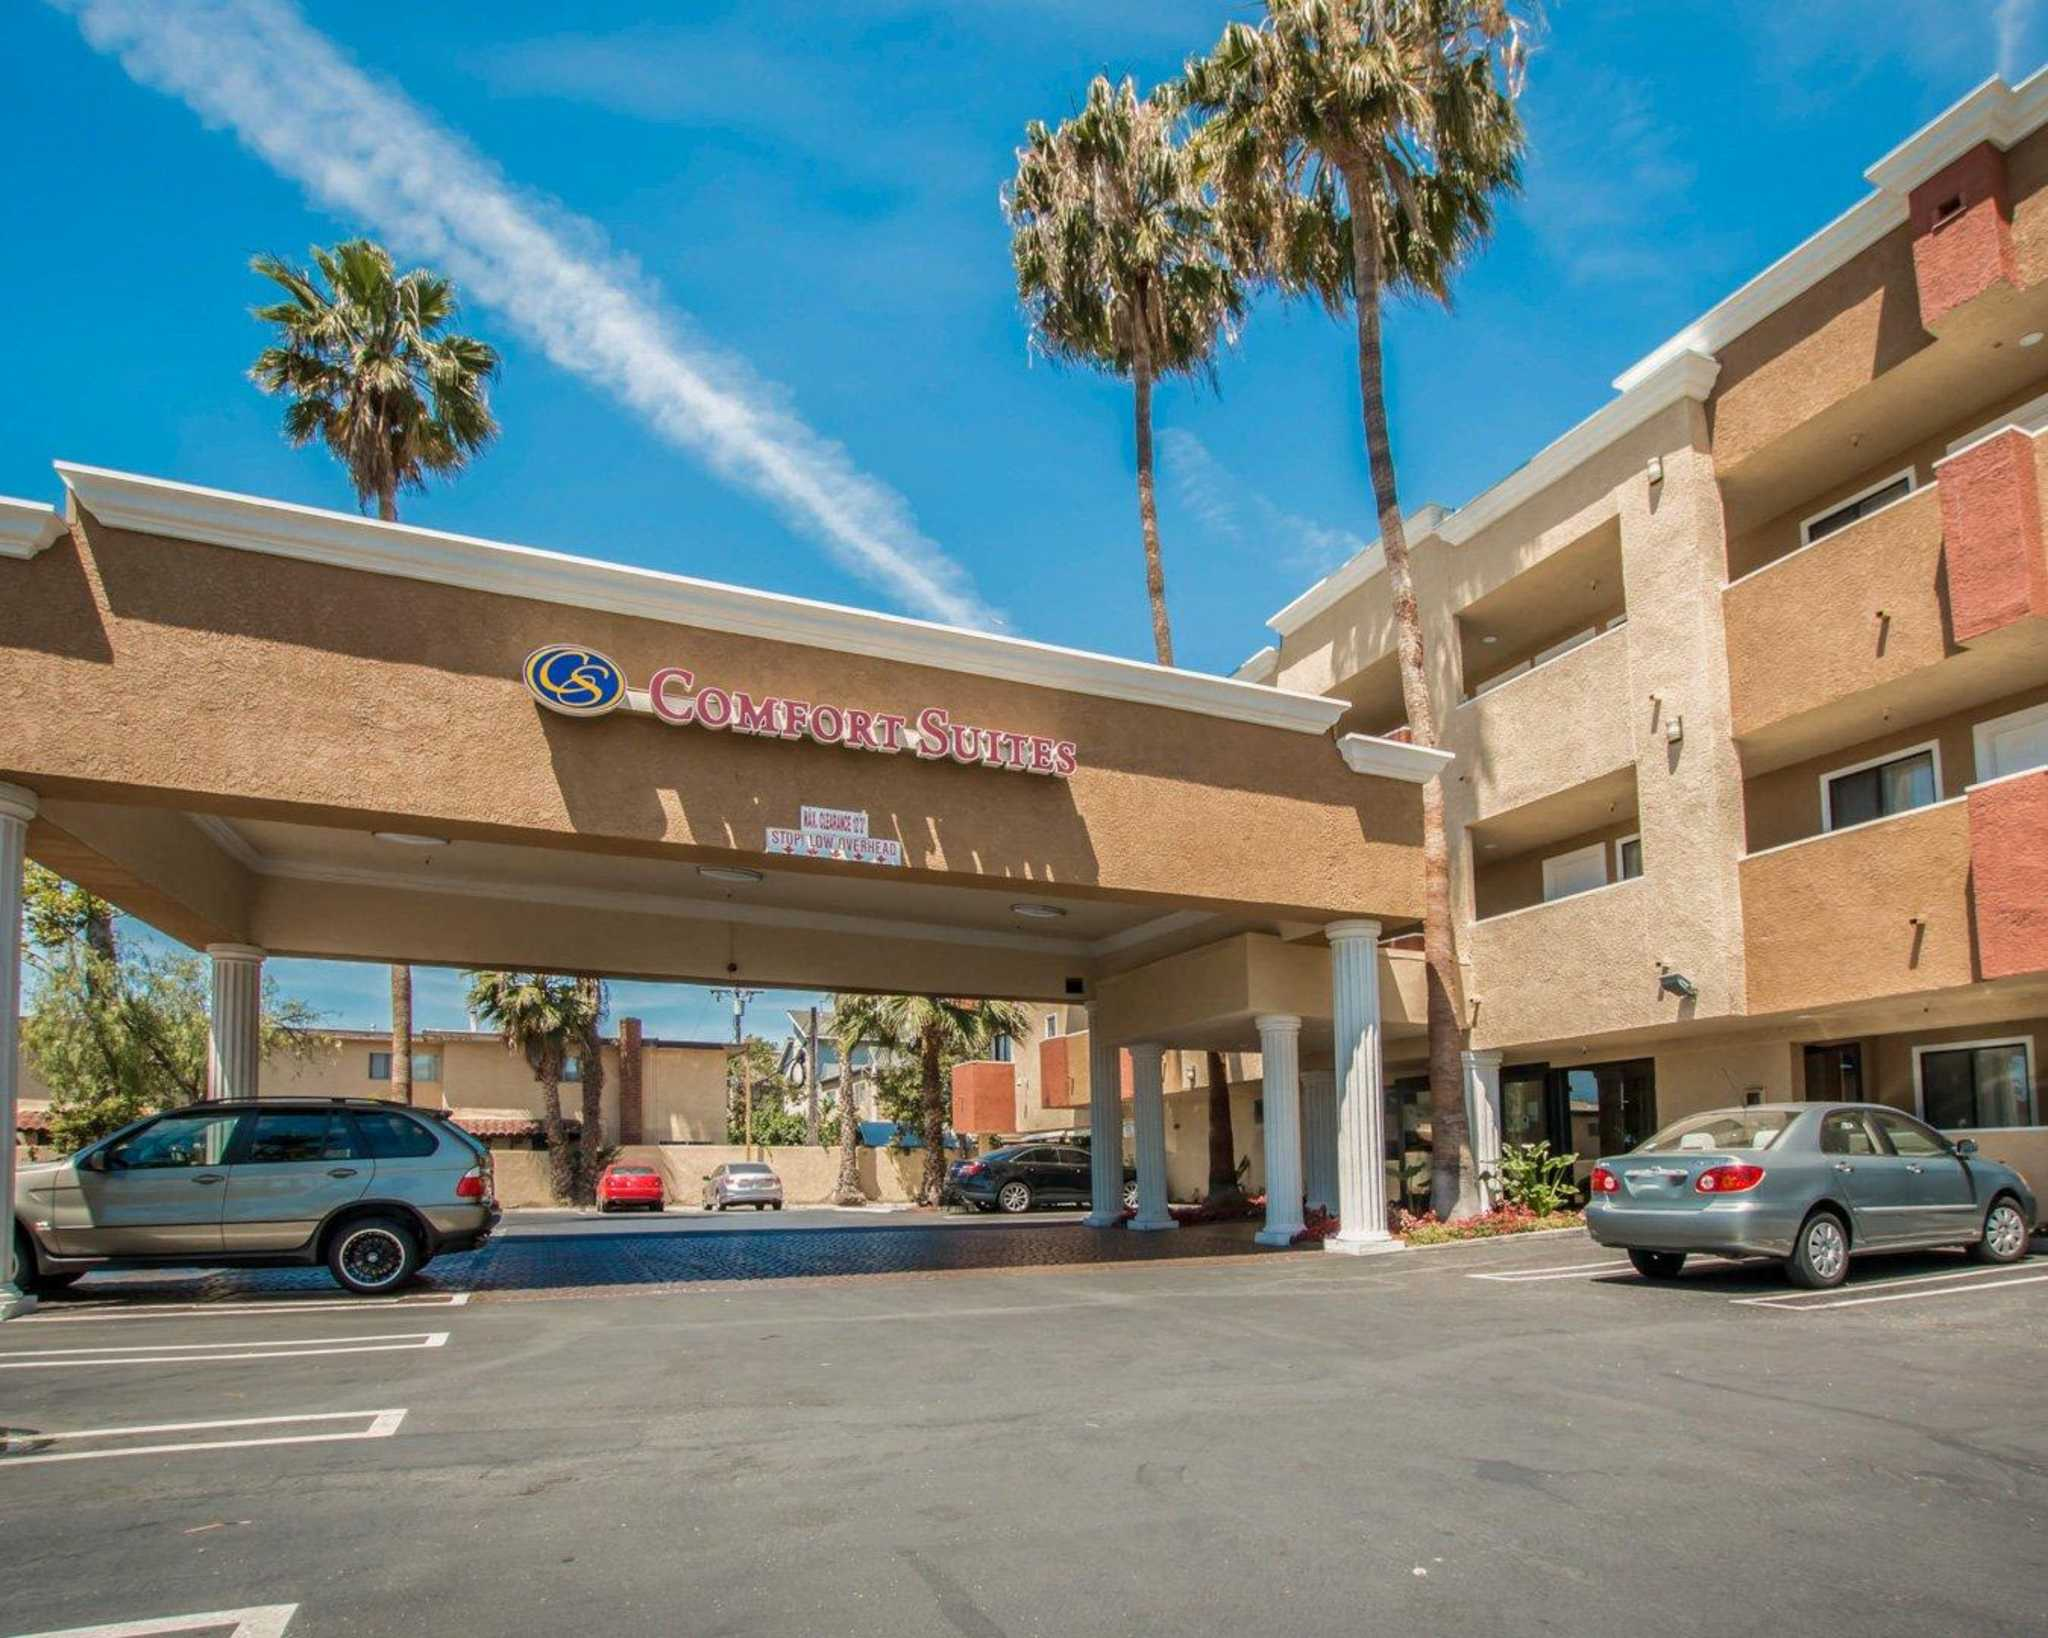 Comfort Suites Huntington Beach image 1